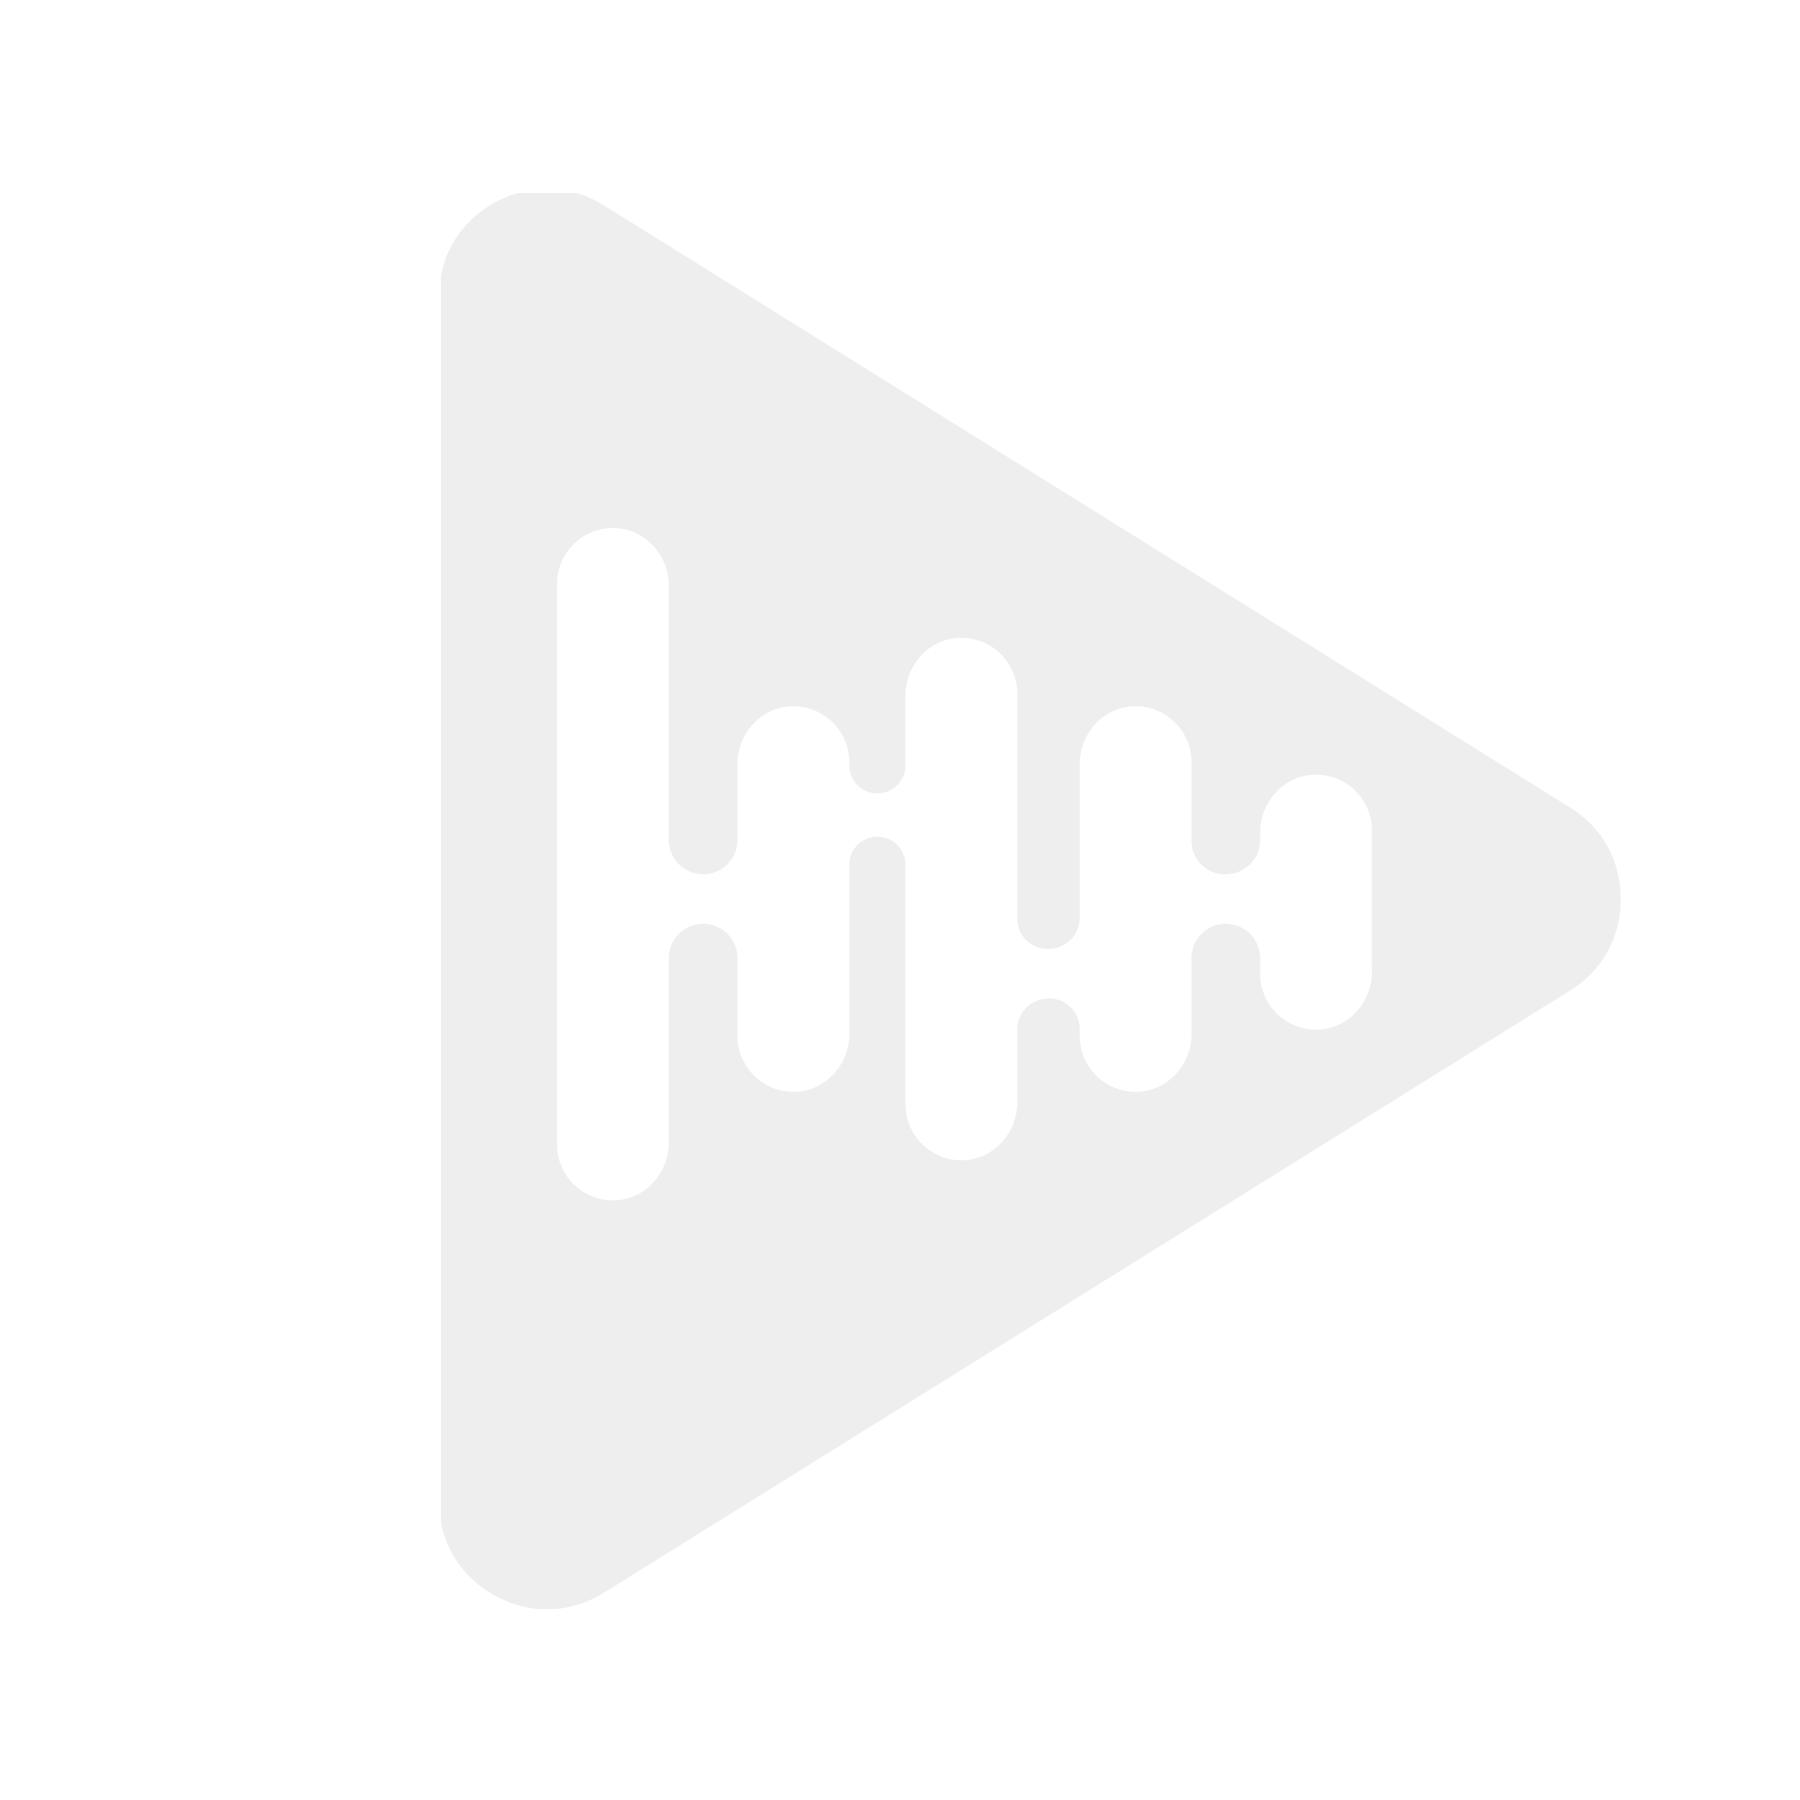 Hertz Dieci DCX 87.3 - 2-veis 3,5